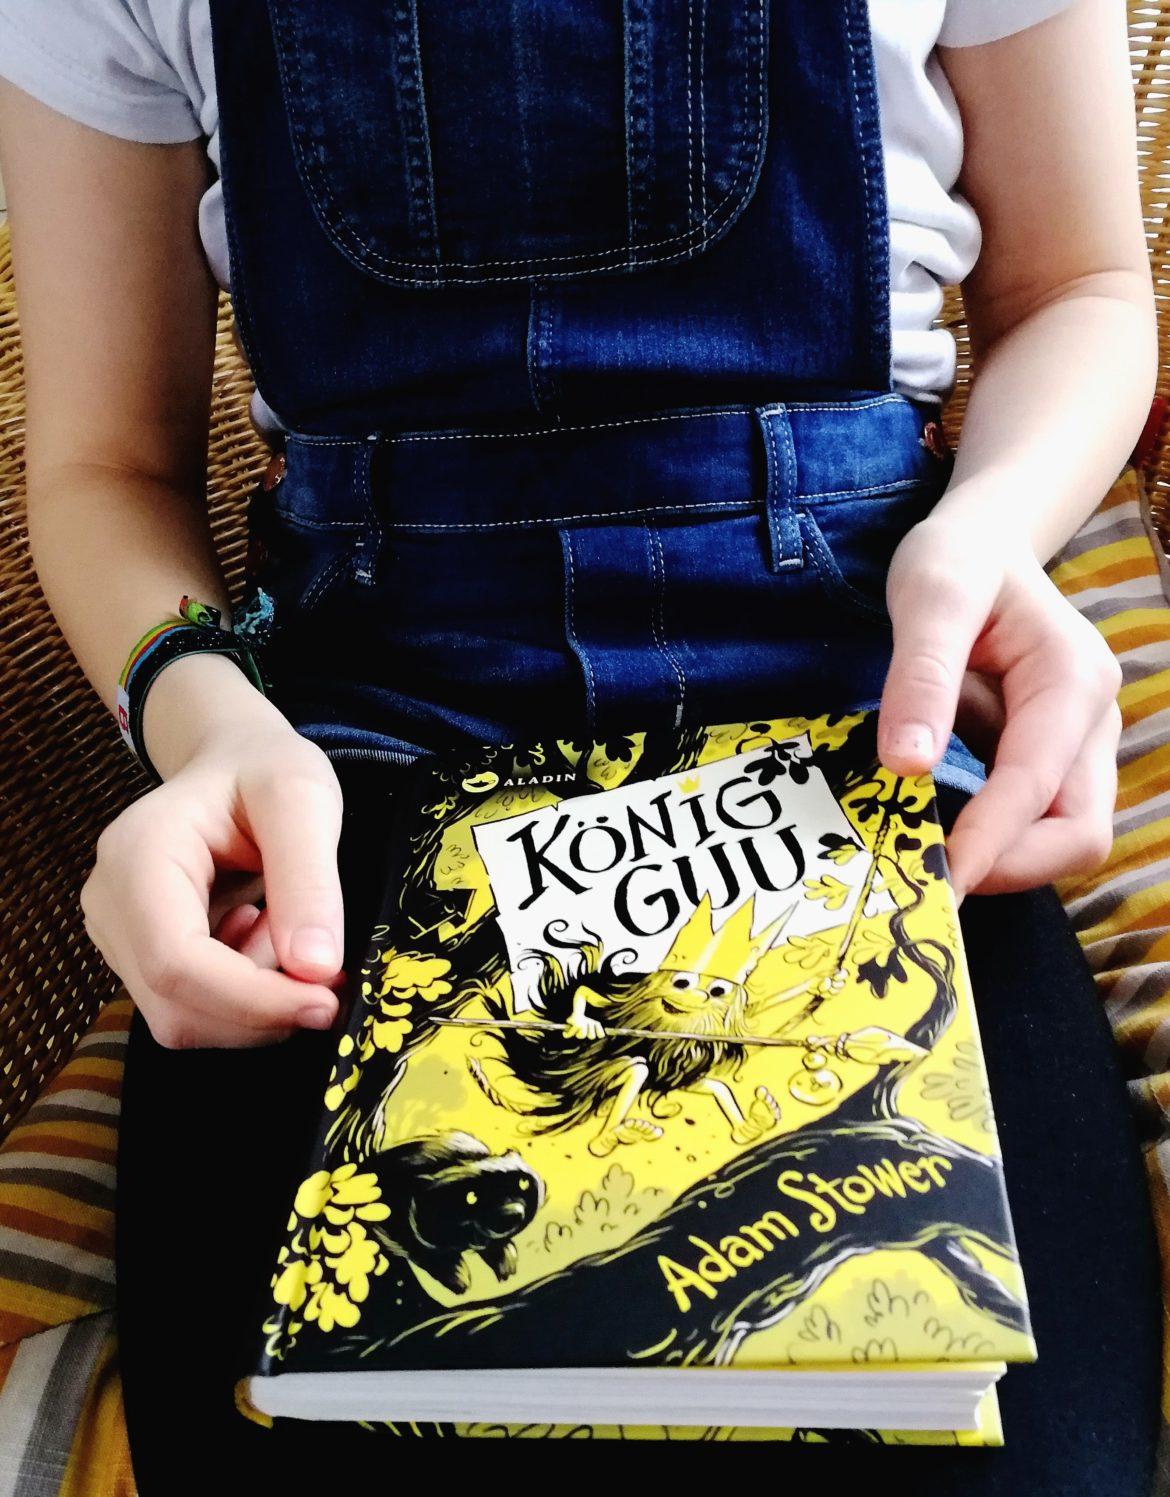 Koenig Guu Aladin Verlag